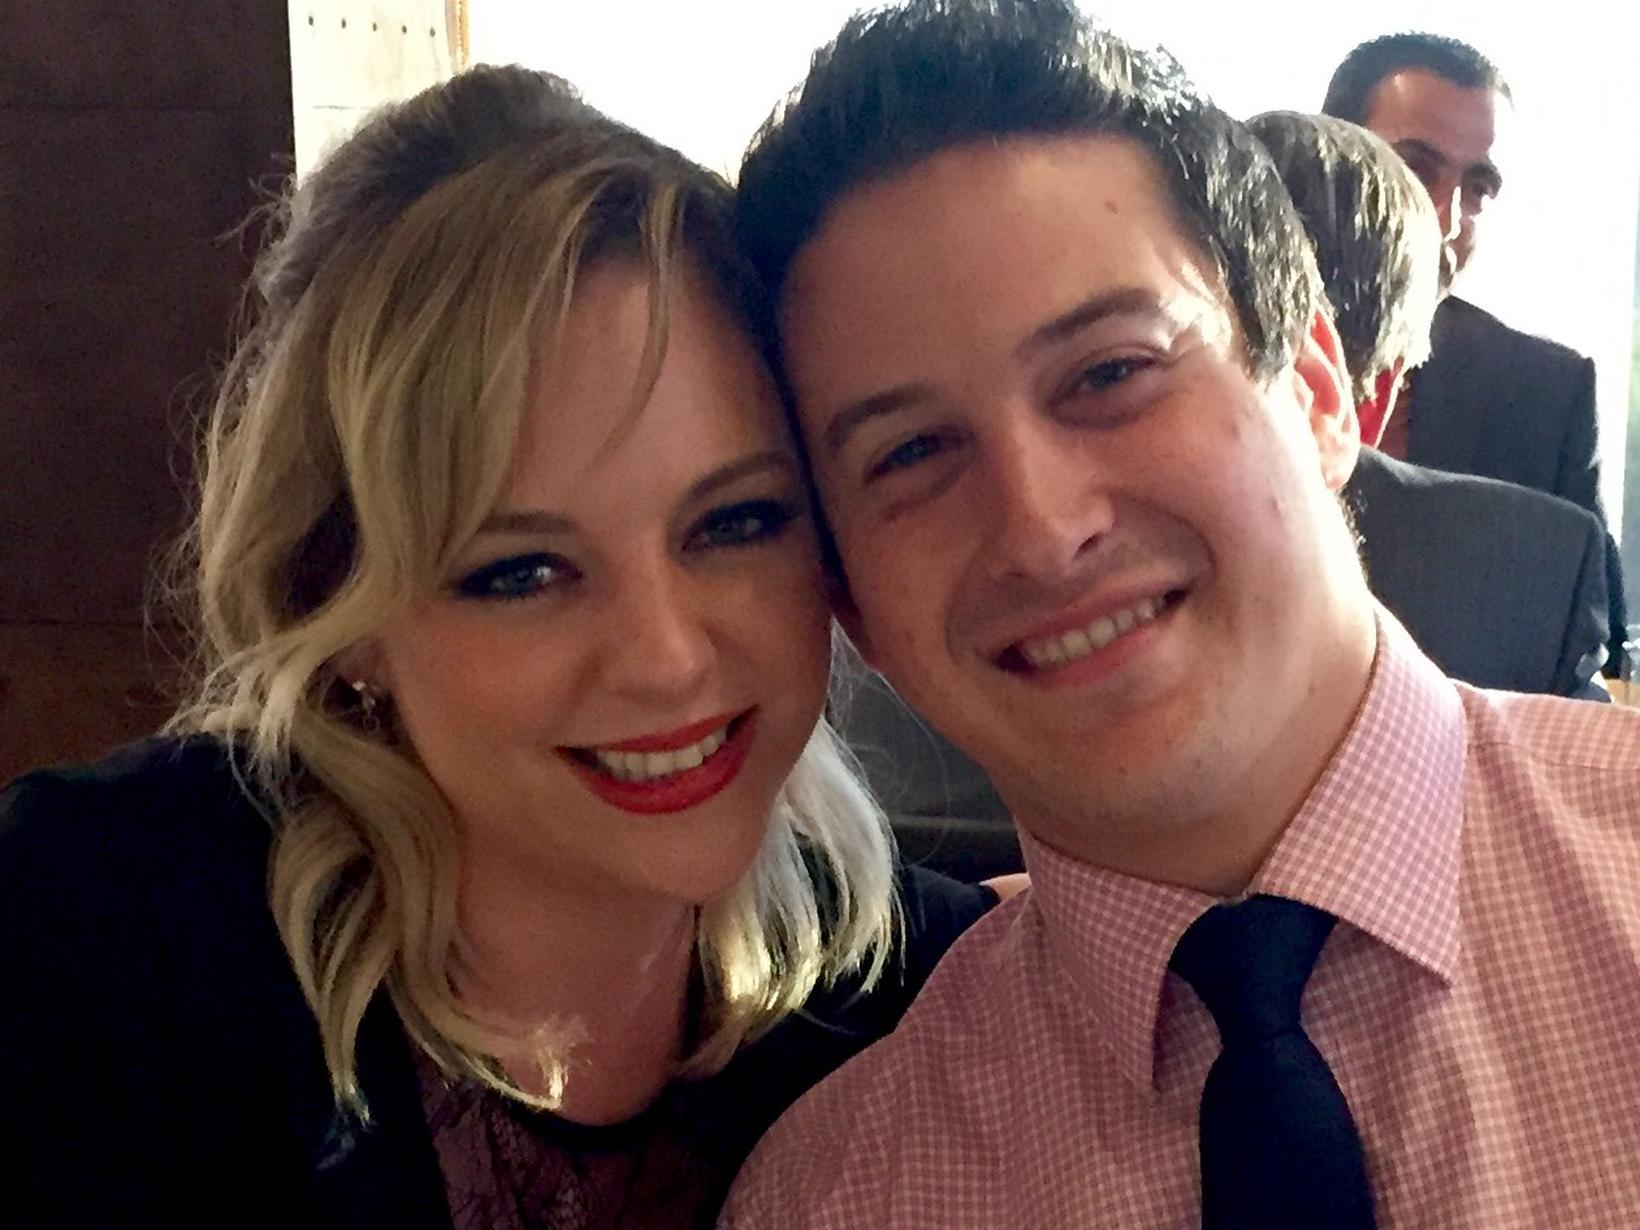 Saskia & Sean from Somerville, Victoria, Australia